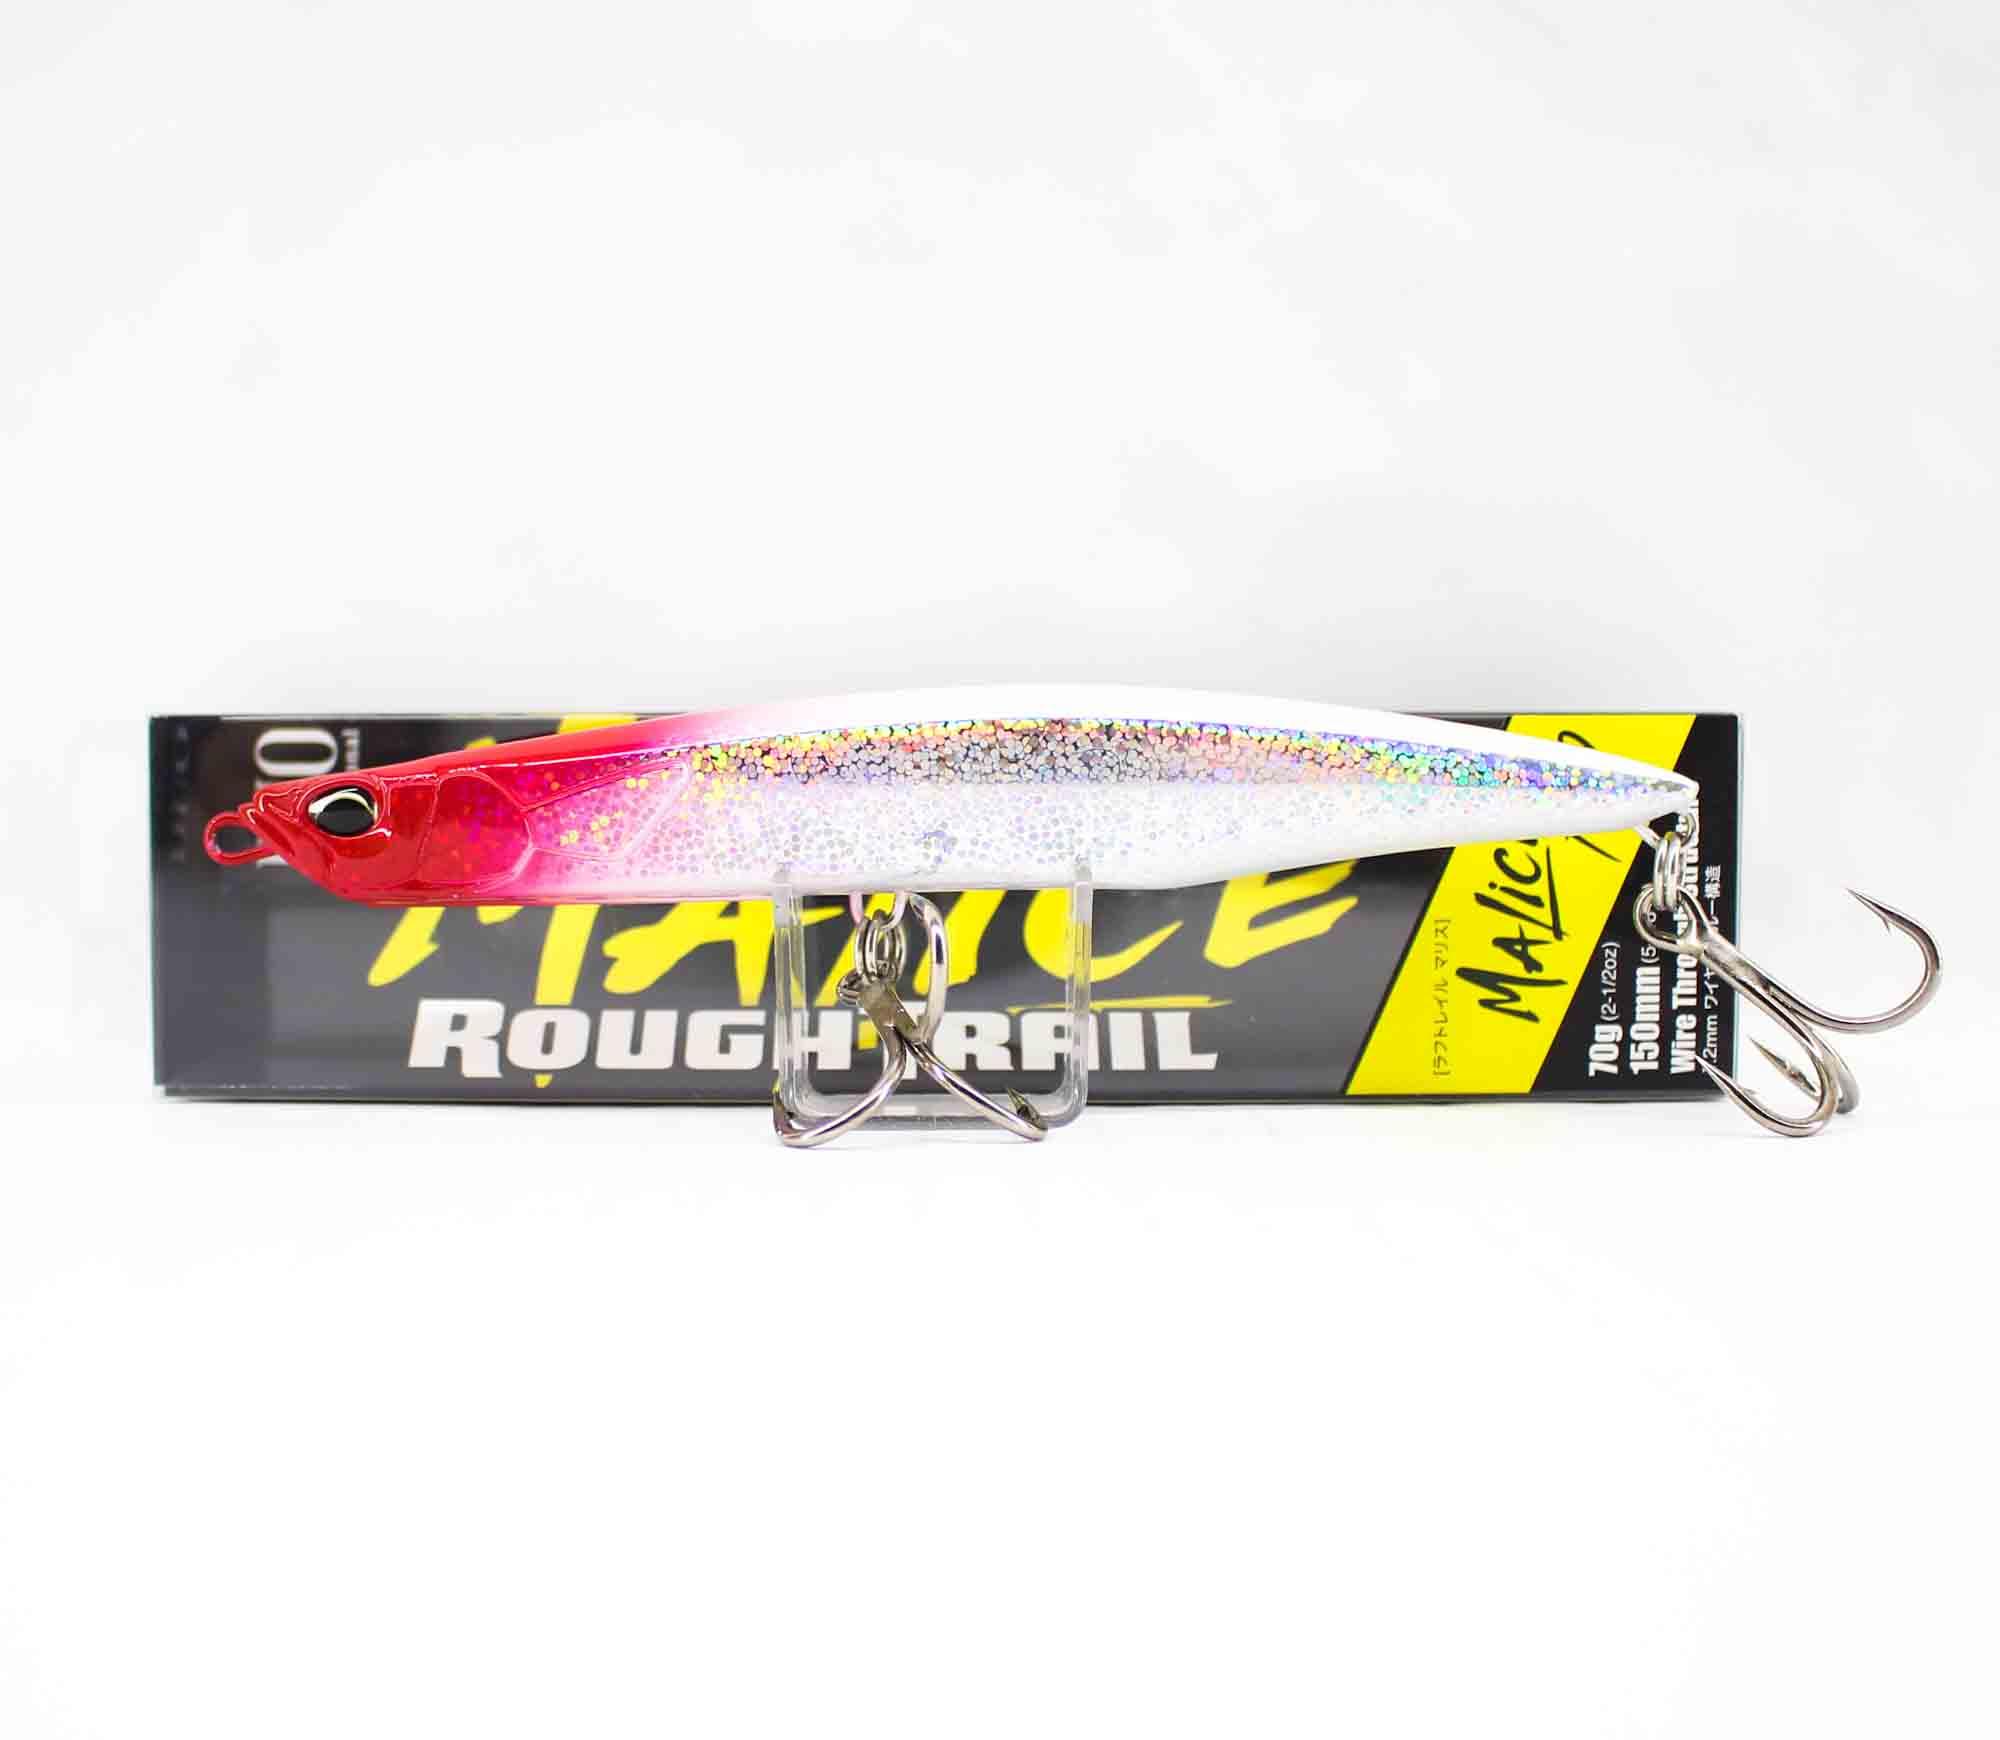 Duo Rough Trail Malice 150 Sinking Lure AOA0220 (8884)